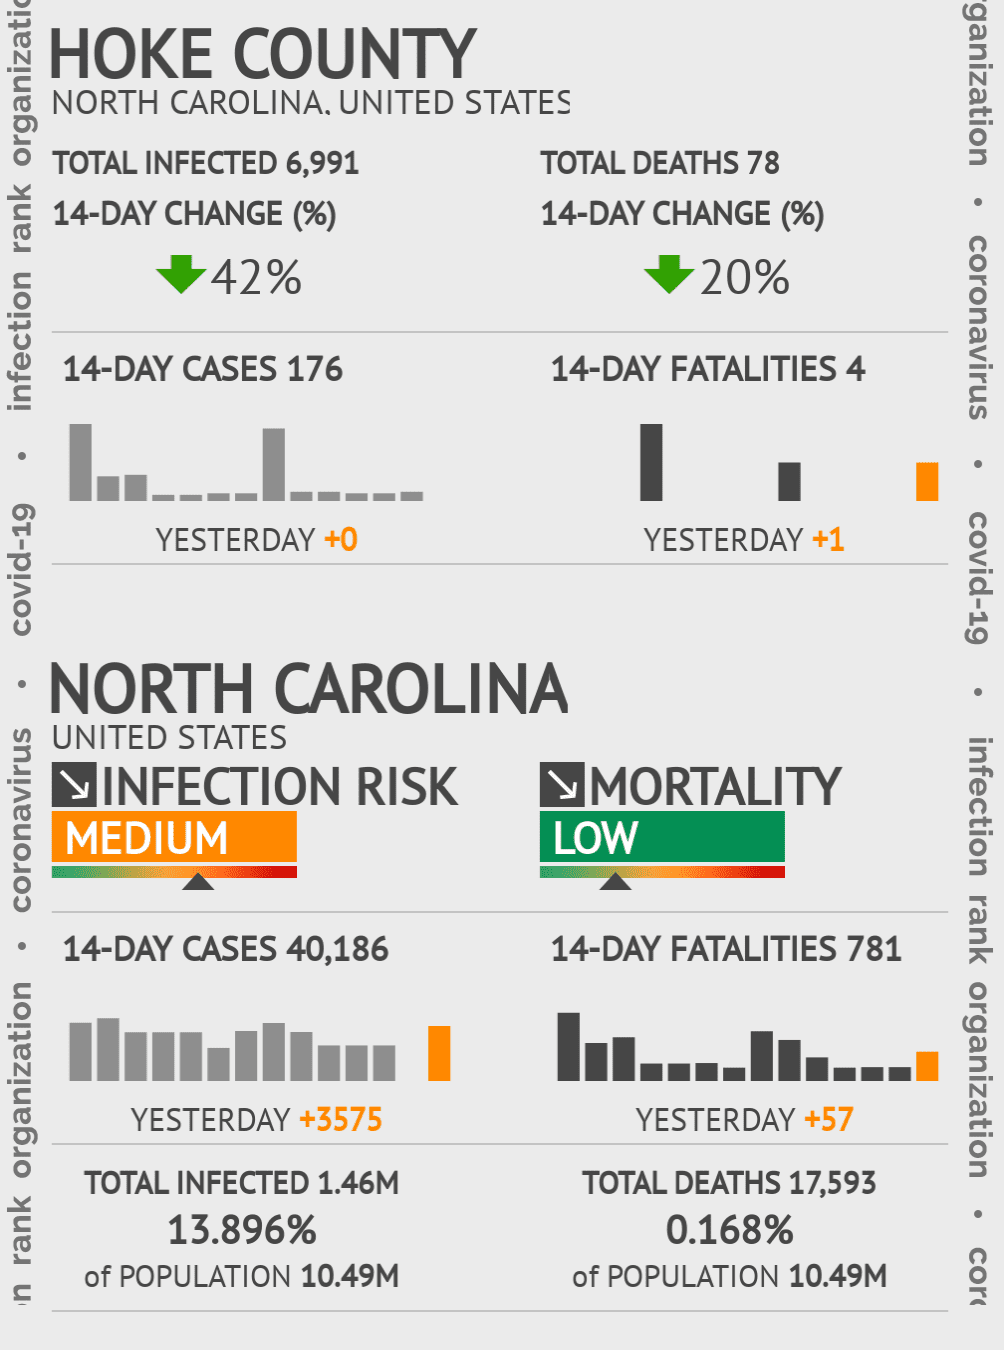 Hoke County Coronavirus Covid-19 Risk of Infection on November 26, 2020